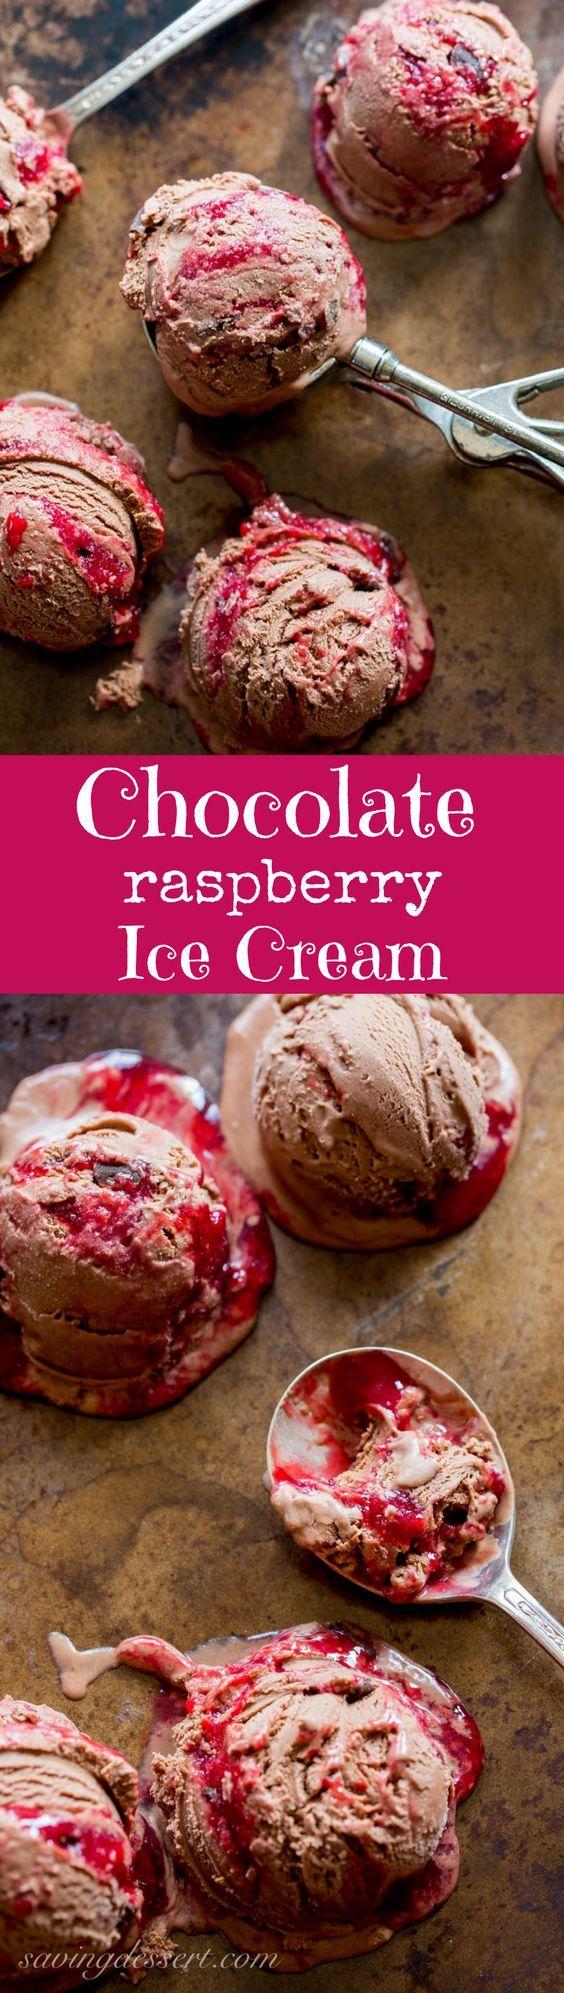 Chocolate Chocolate Chunk-Raspberry Swirl Ice Cream ~ a creamy, sweet, tart and delicious treat from www.savingdessert.com